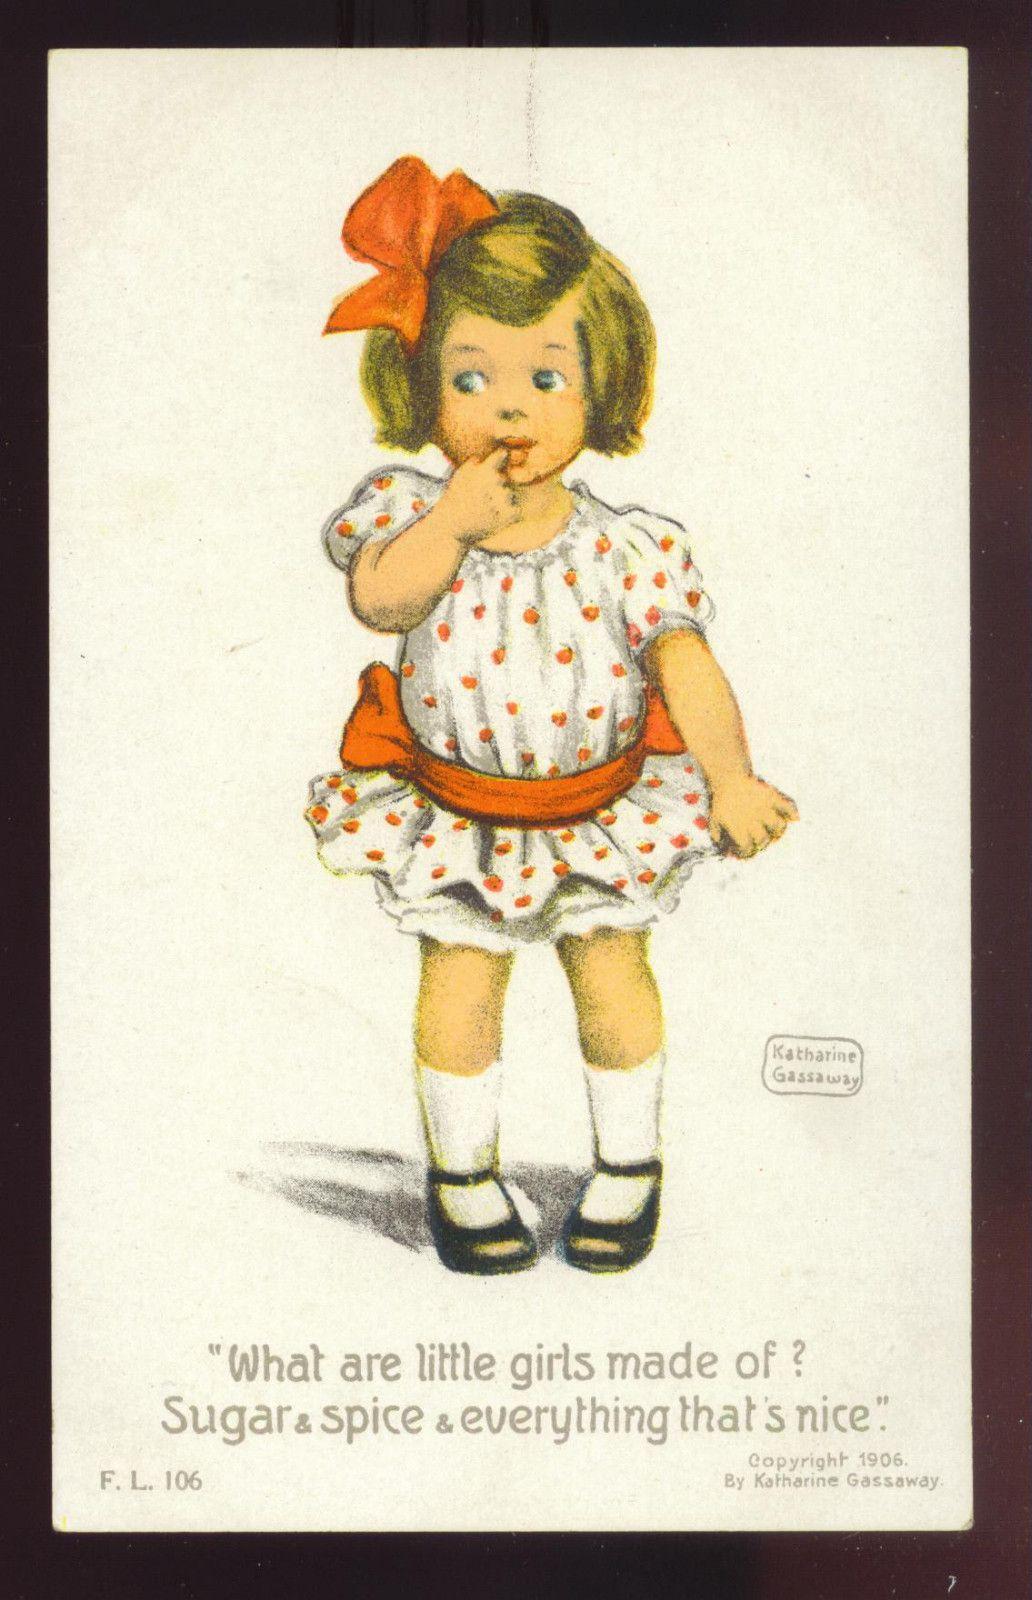 K. GASSAWAY DESIGN ~ LITTLE GIRL SUCKING FINGER, PUB BY ROTOGRAPH ...